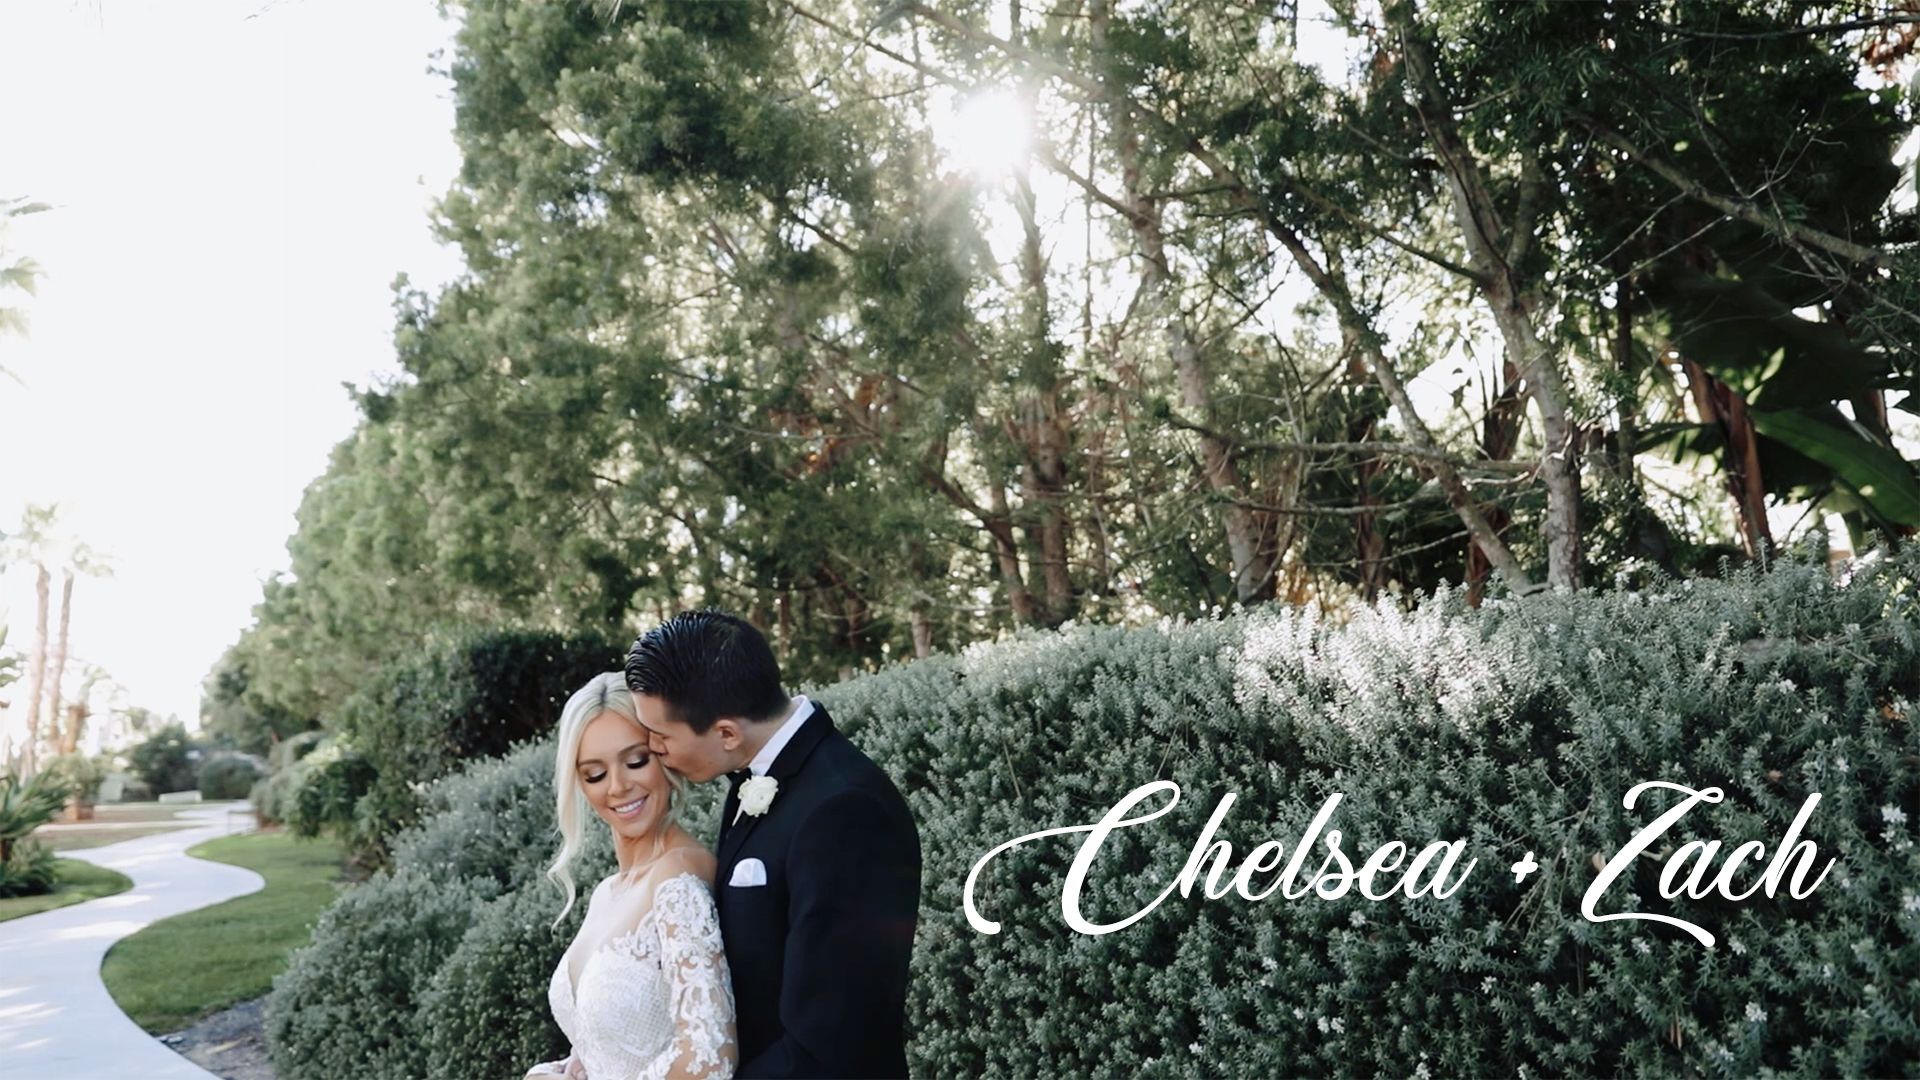 Chelsea + Zach | La Jolla Amago, California | Estancia La Jolla